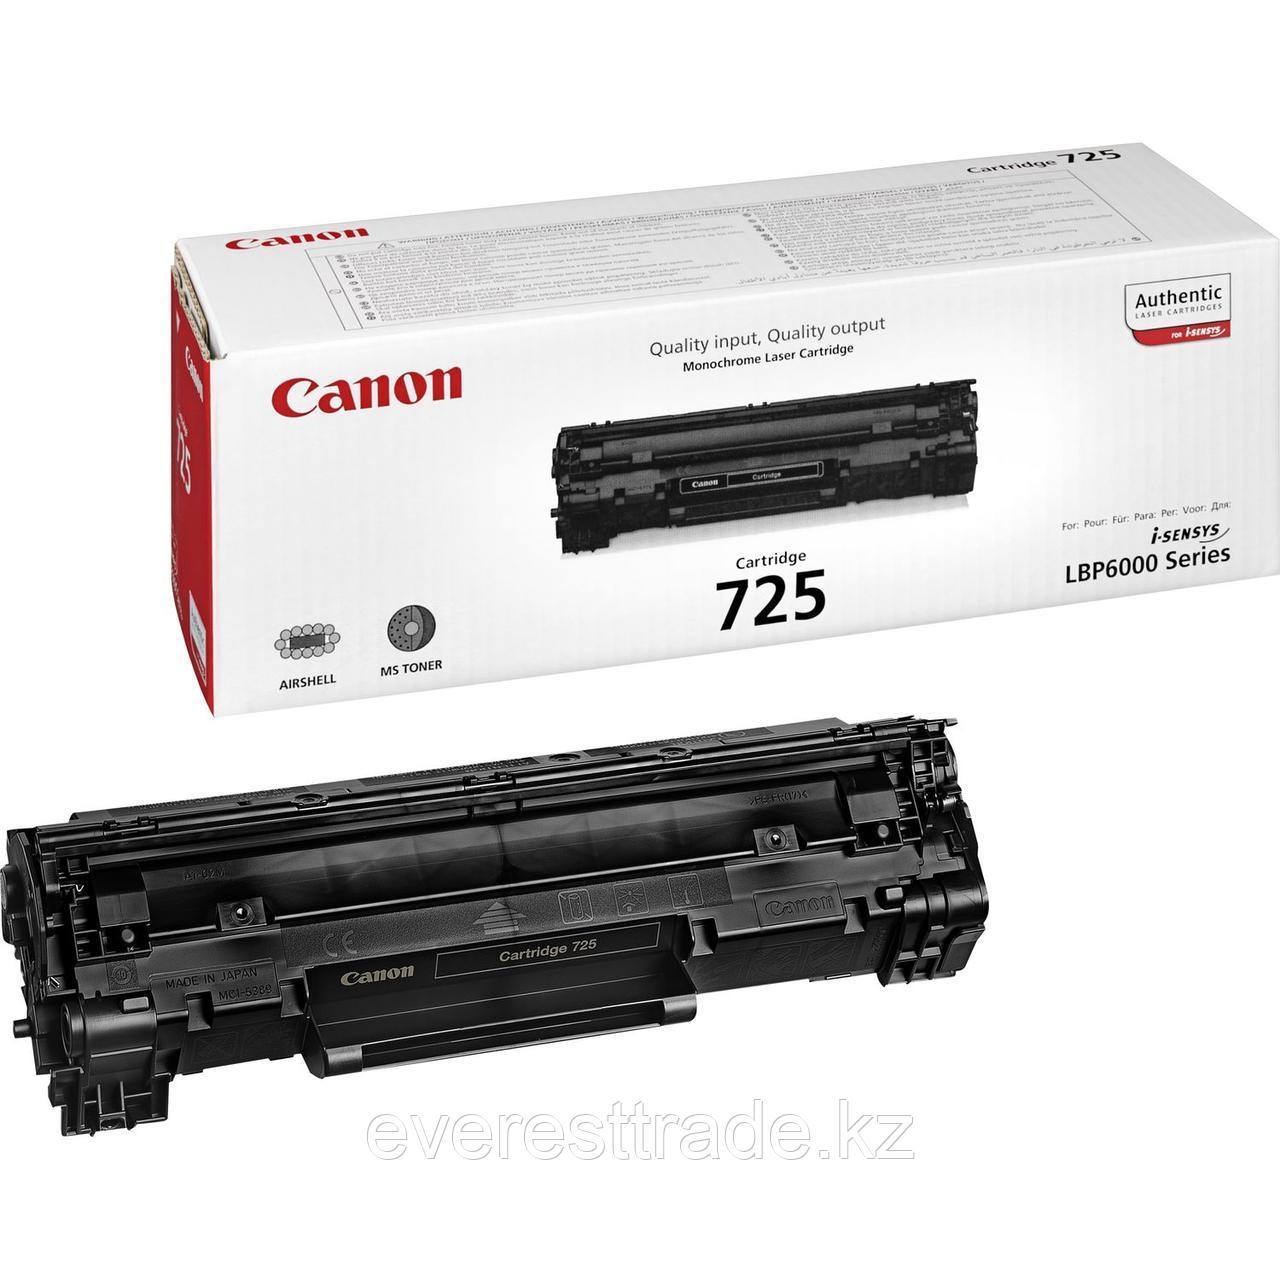 Canon Картридж Canon CRG 725 для MF3010 LBP6030